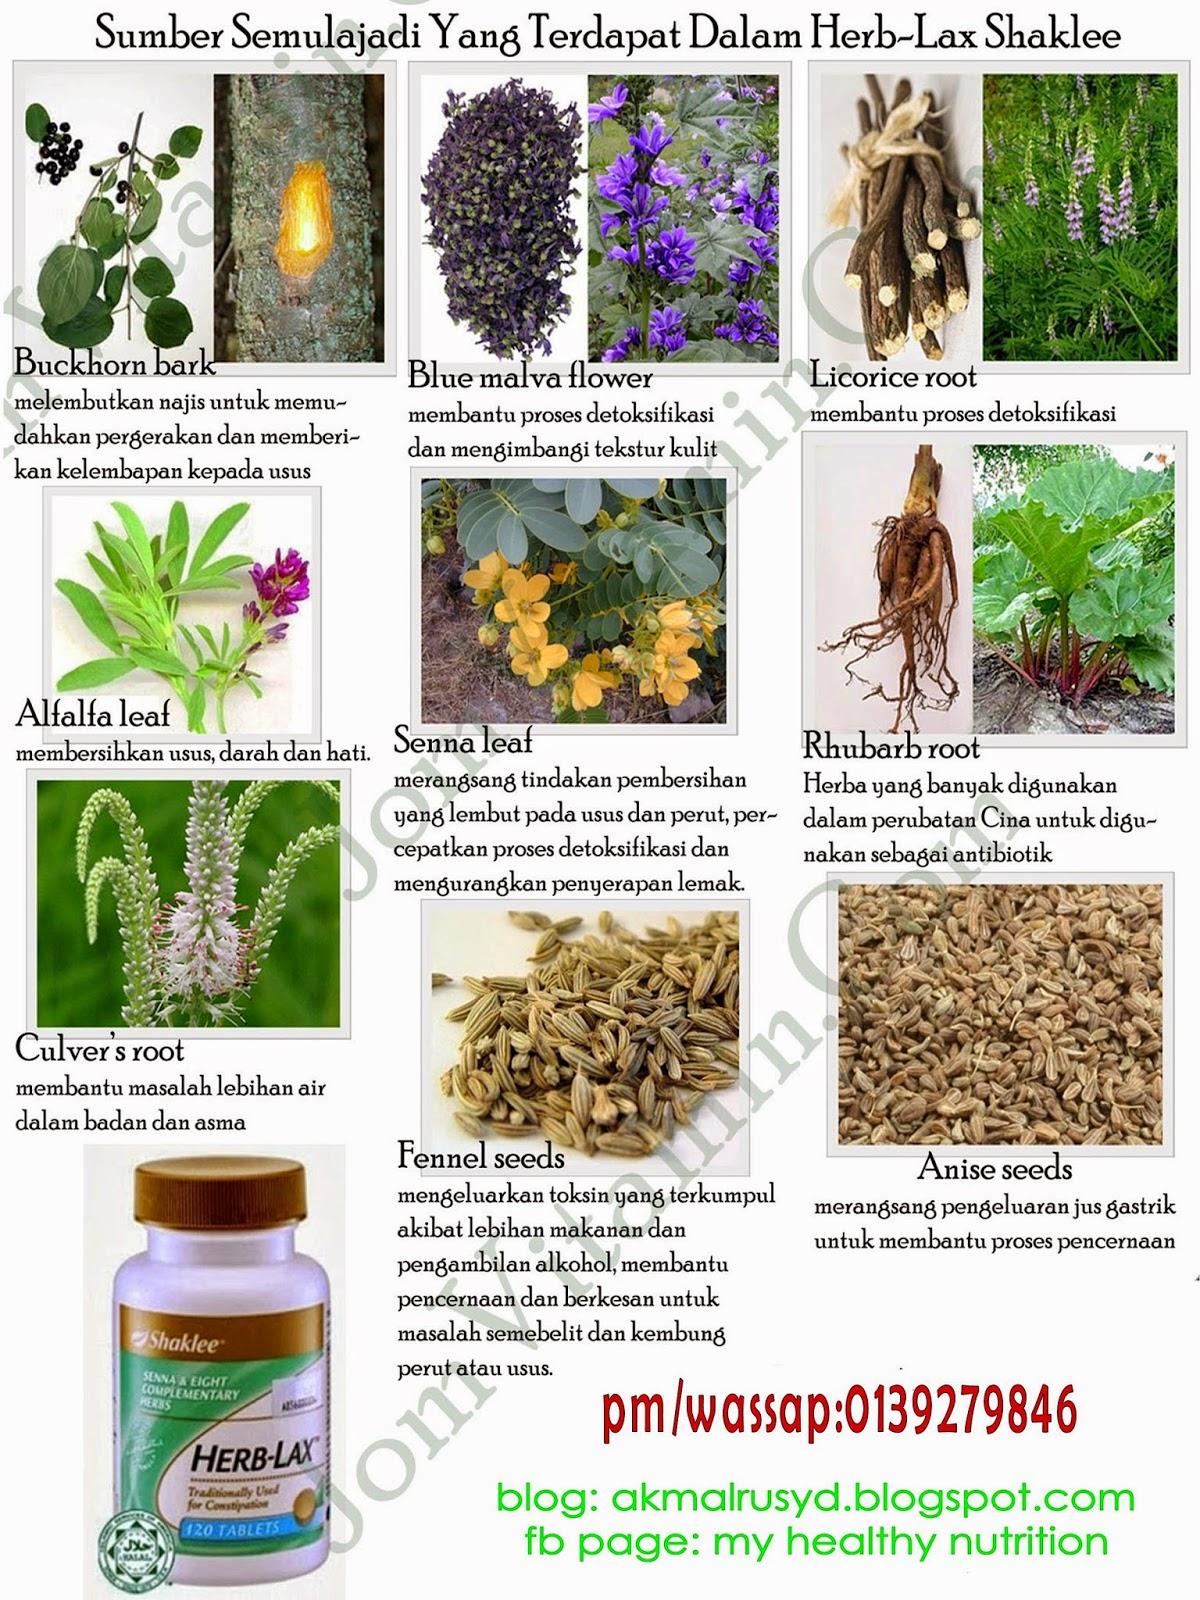 kandungan Herb-Lax Shaklee